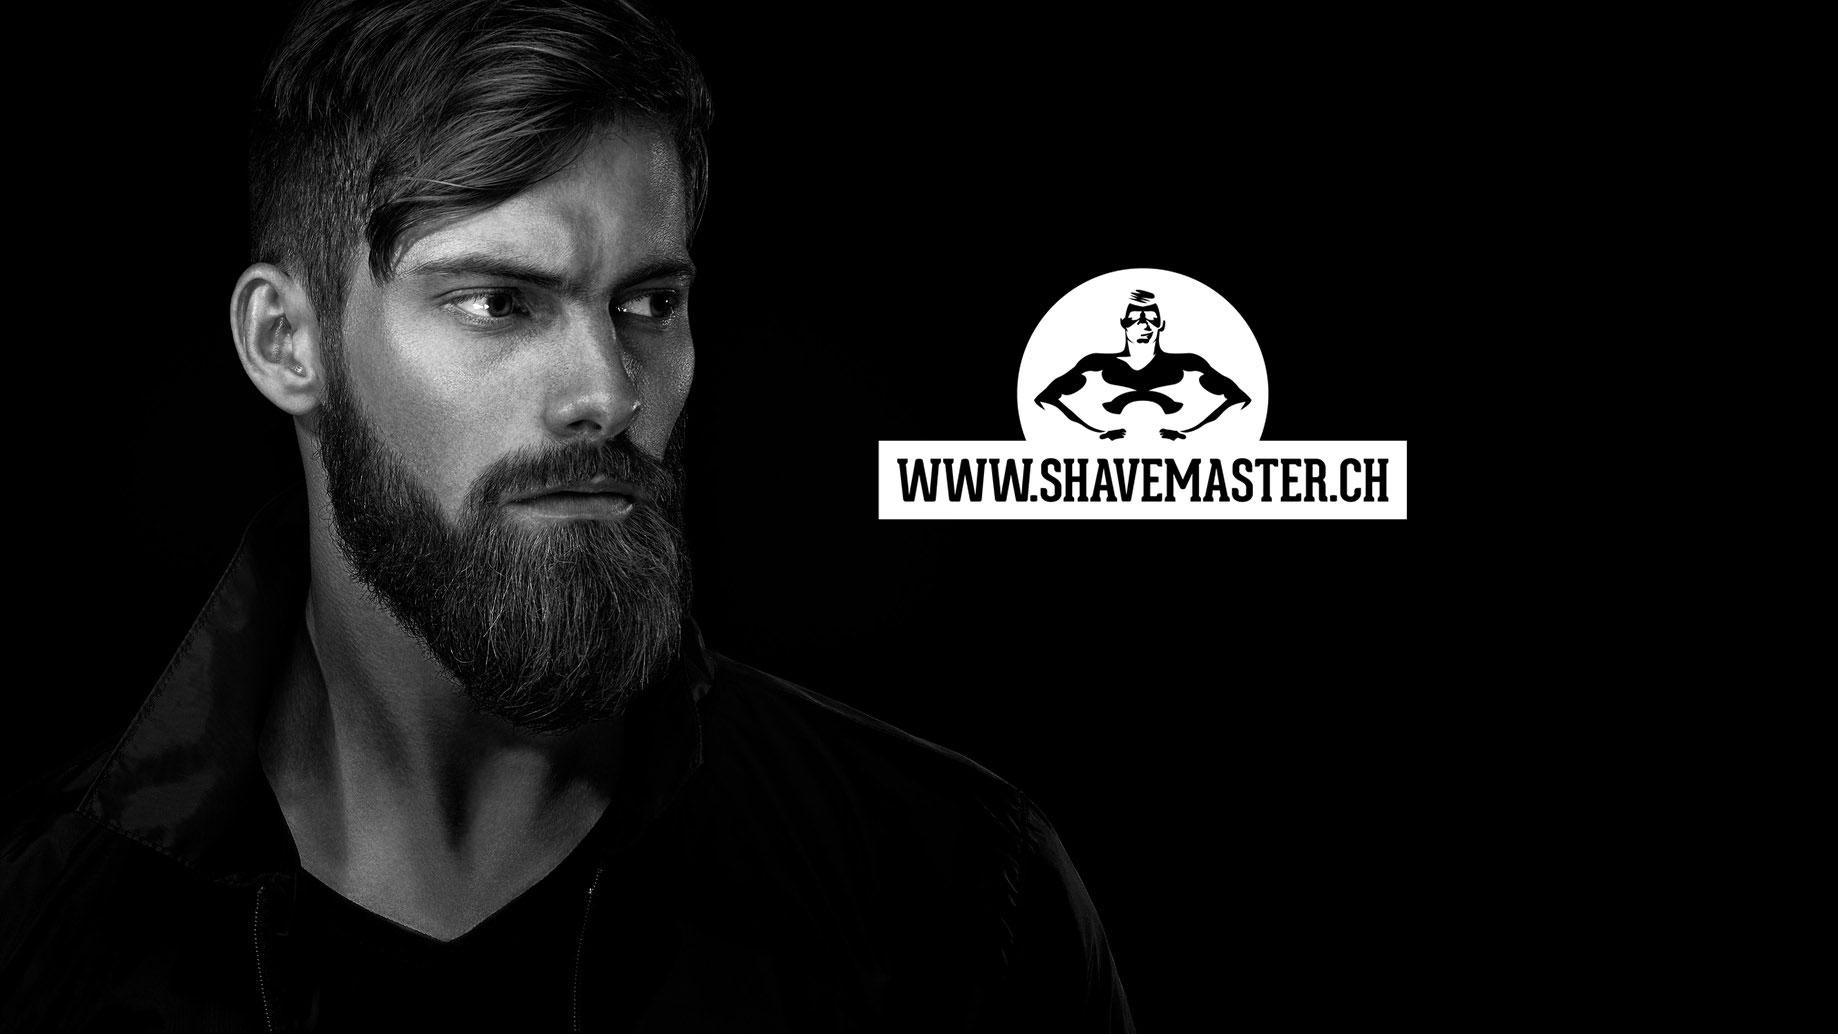 (c) Shavemaster.ch